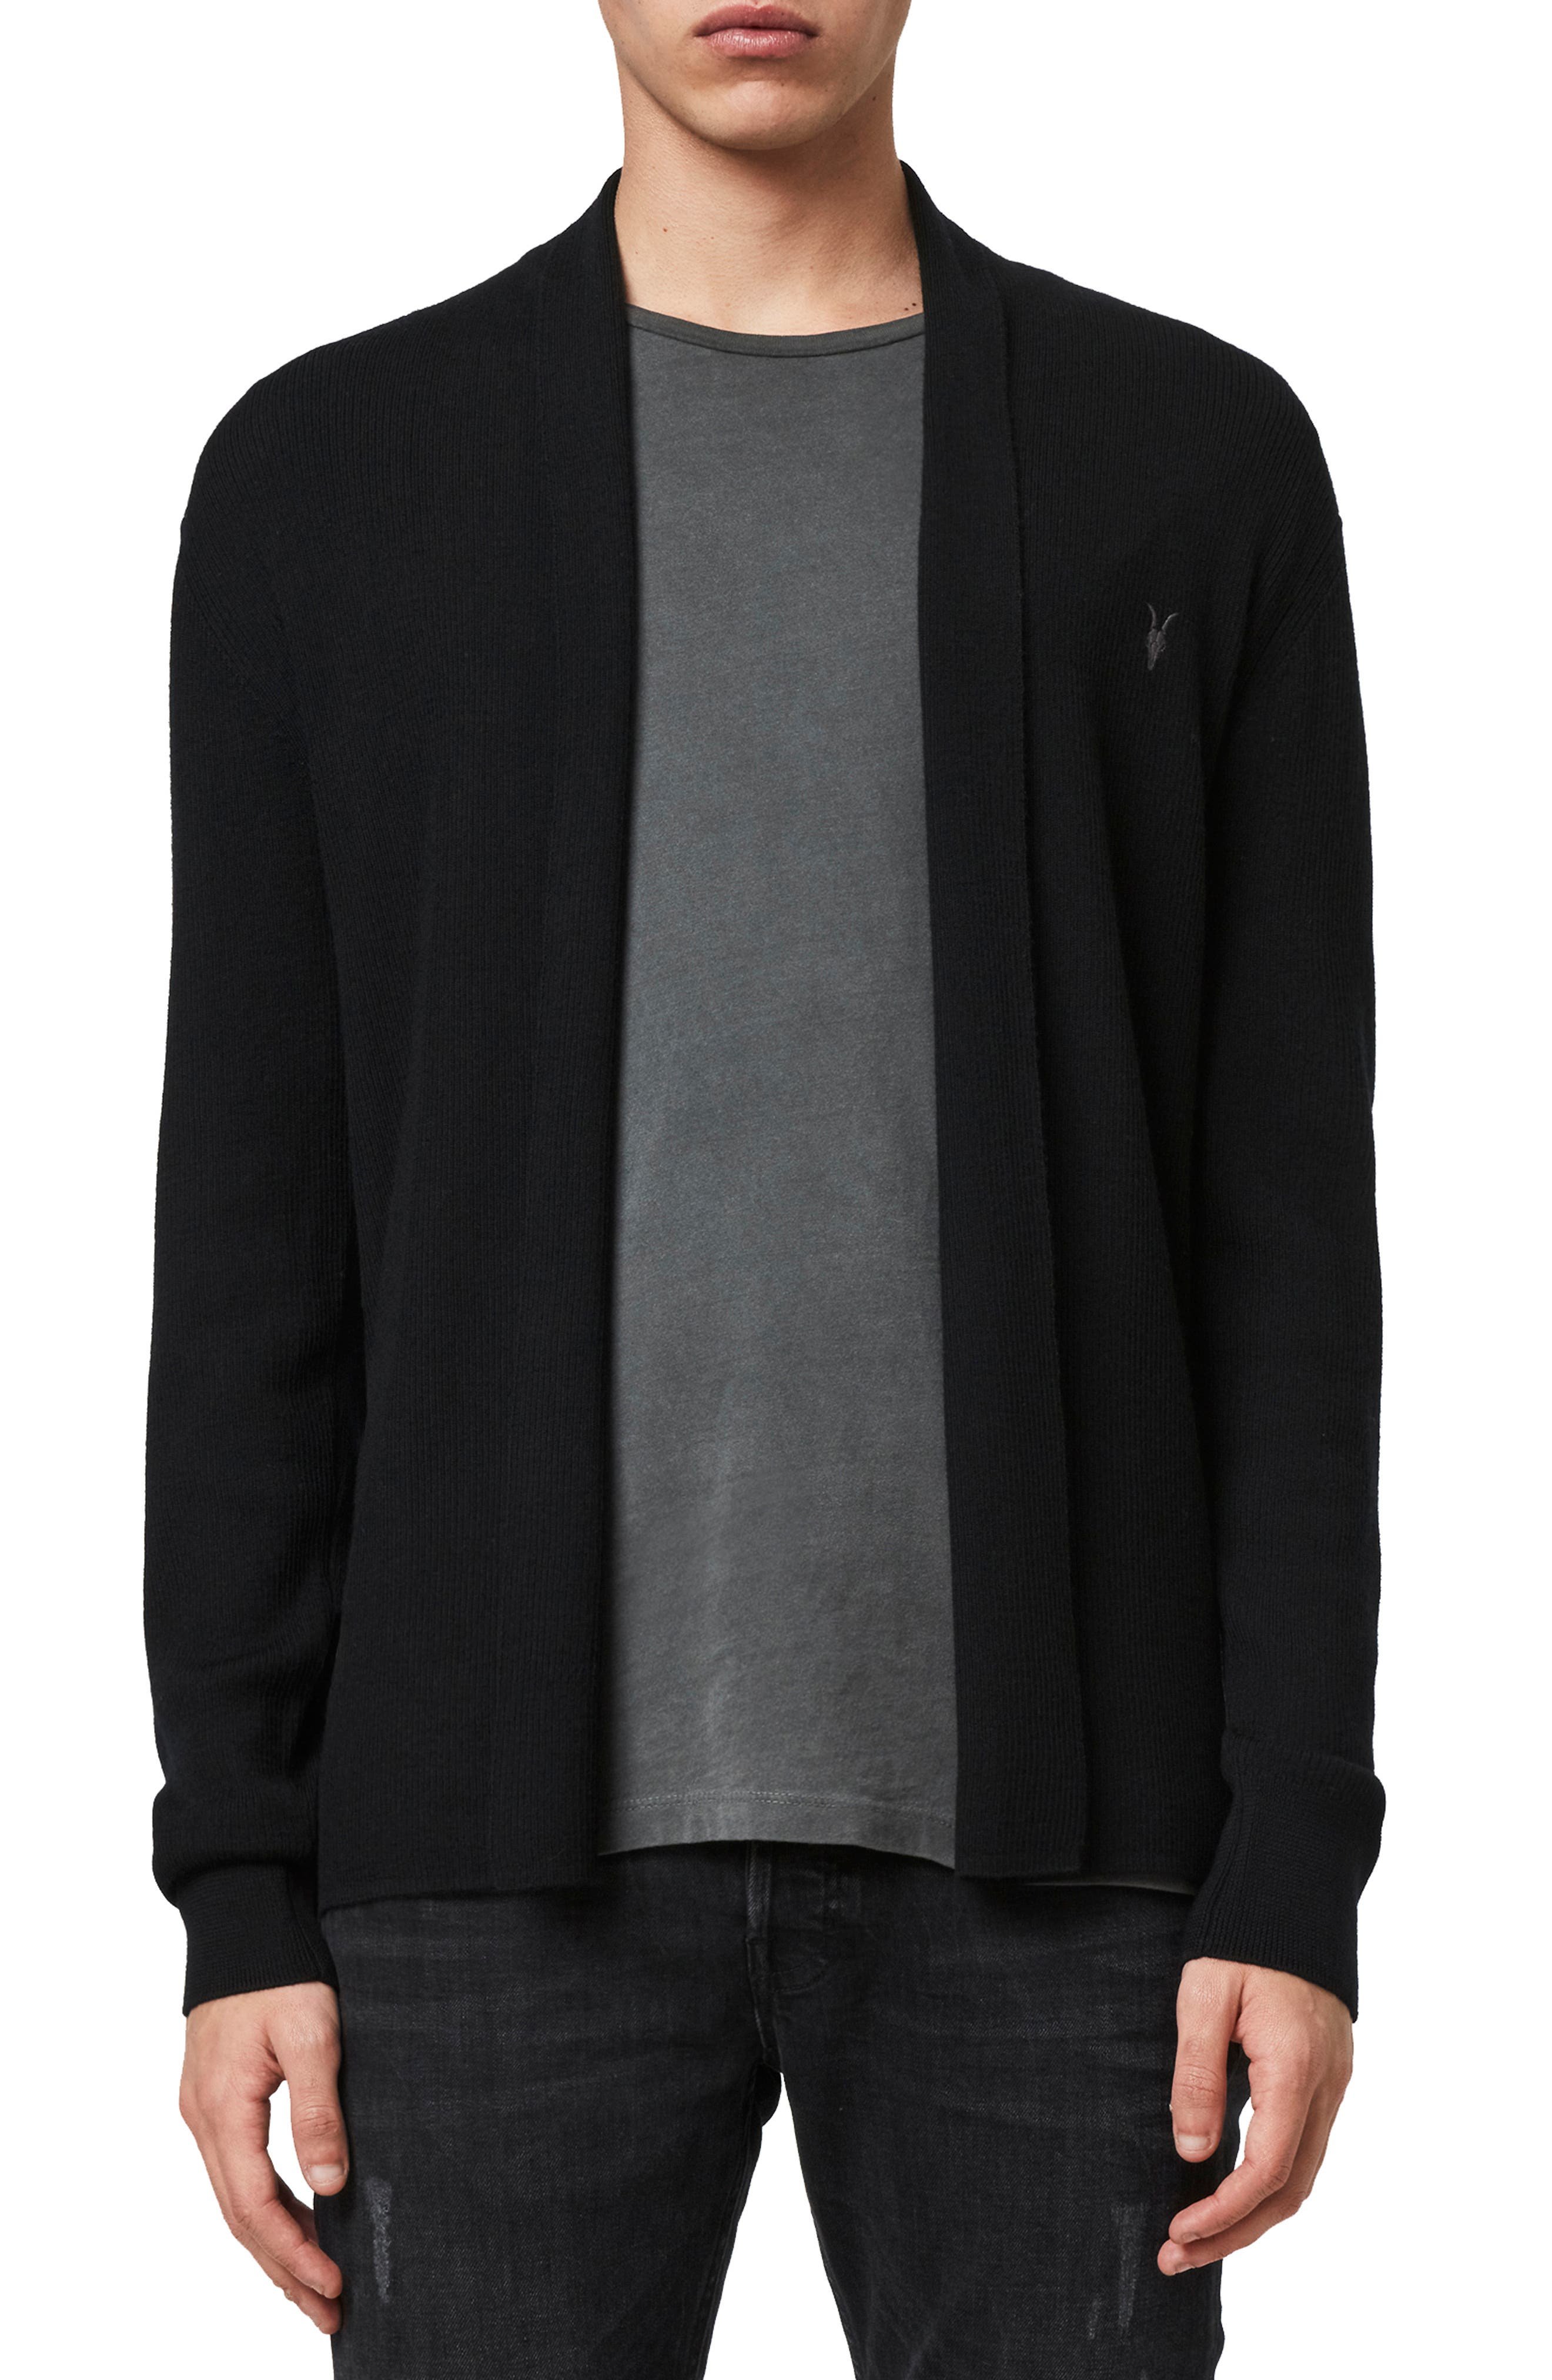 Mode Slim Fit Wool Cardigan